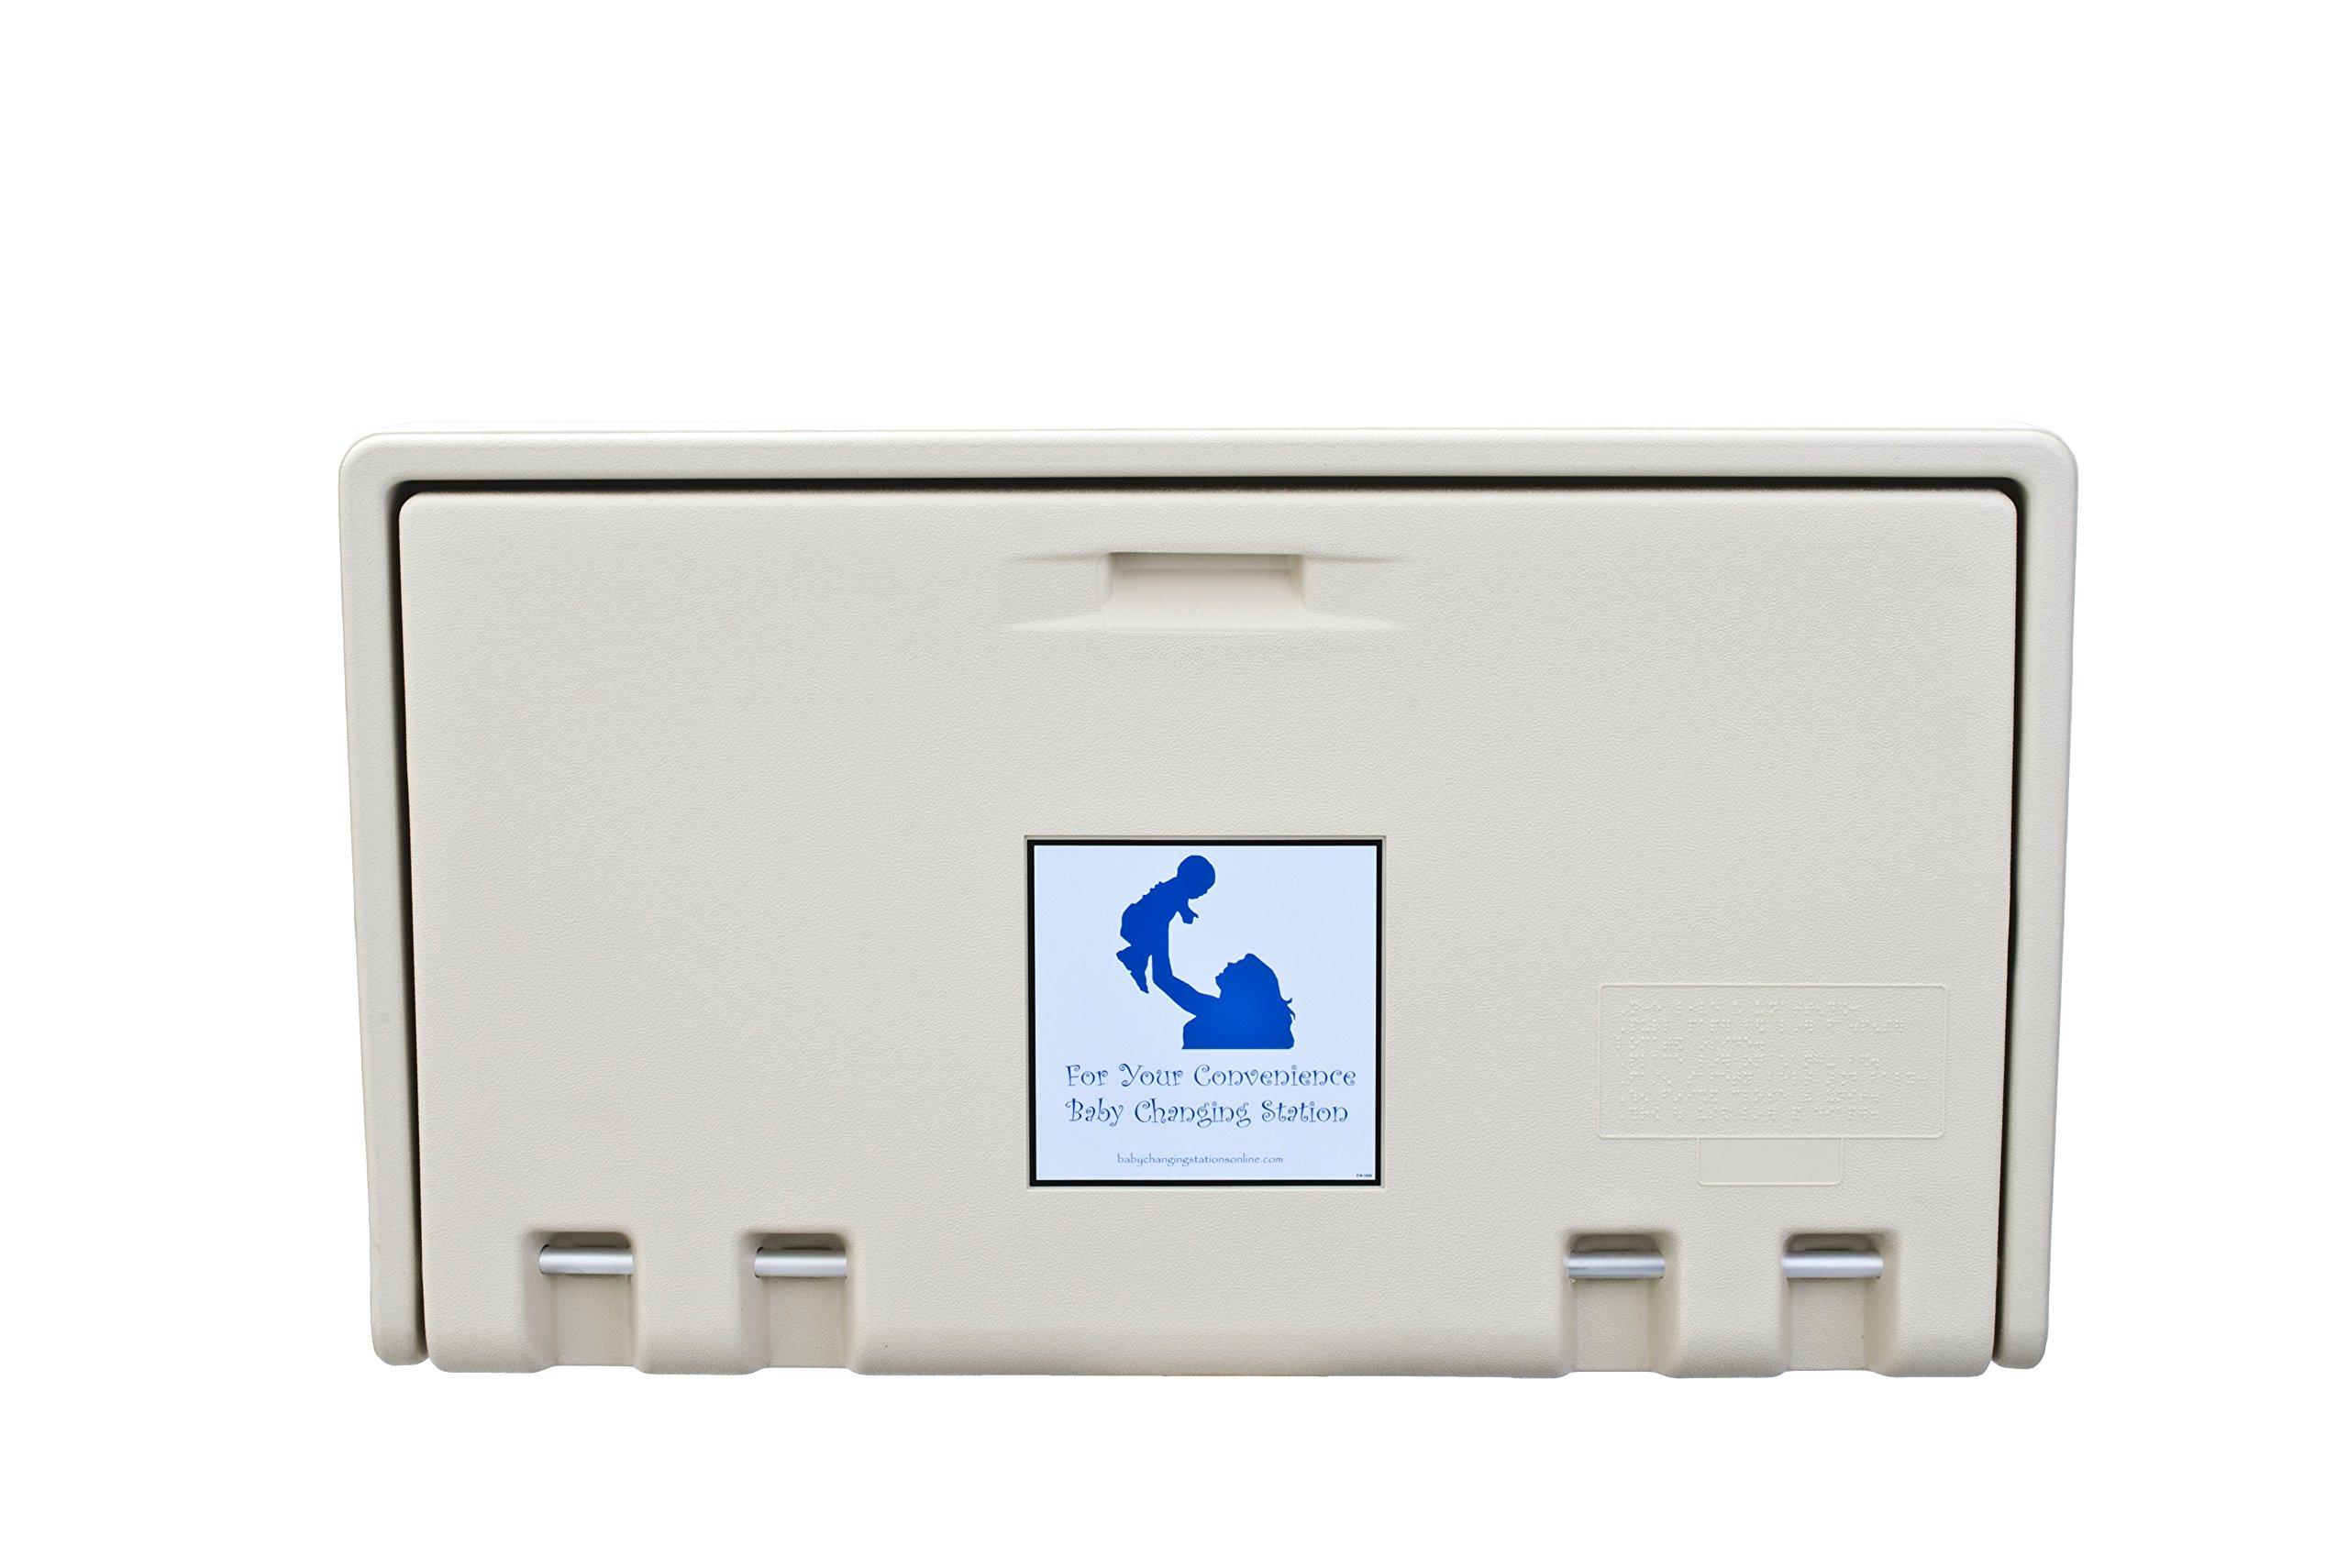 AHD 107-00 Cream Horizontal Baby Changing Station